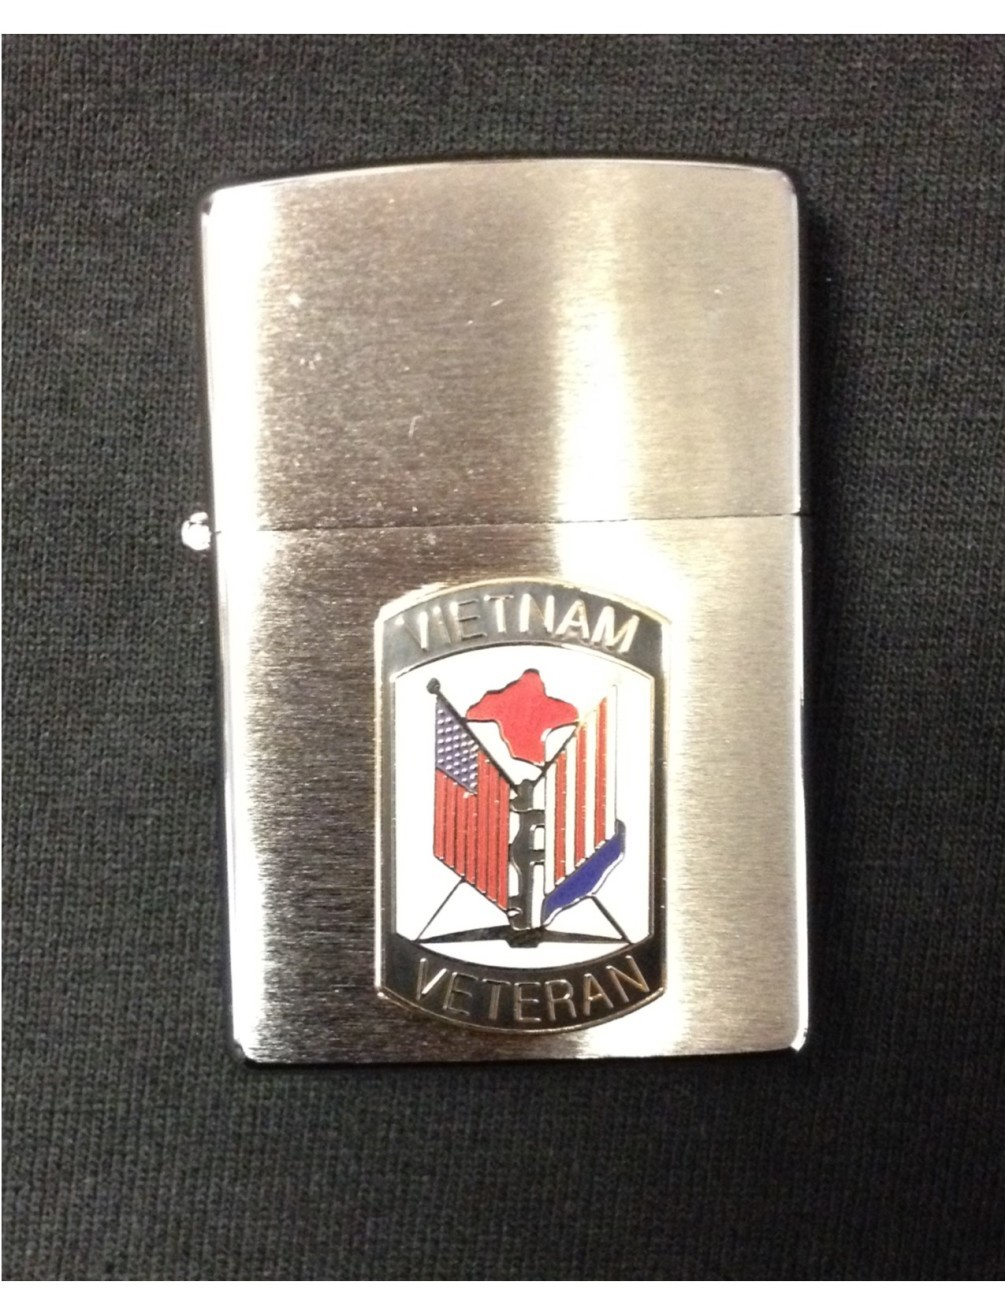 Vietnam Veteran ZIPPO Lighter